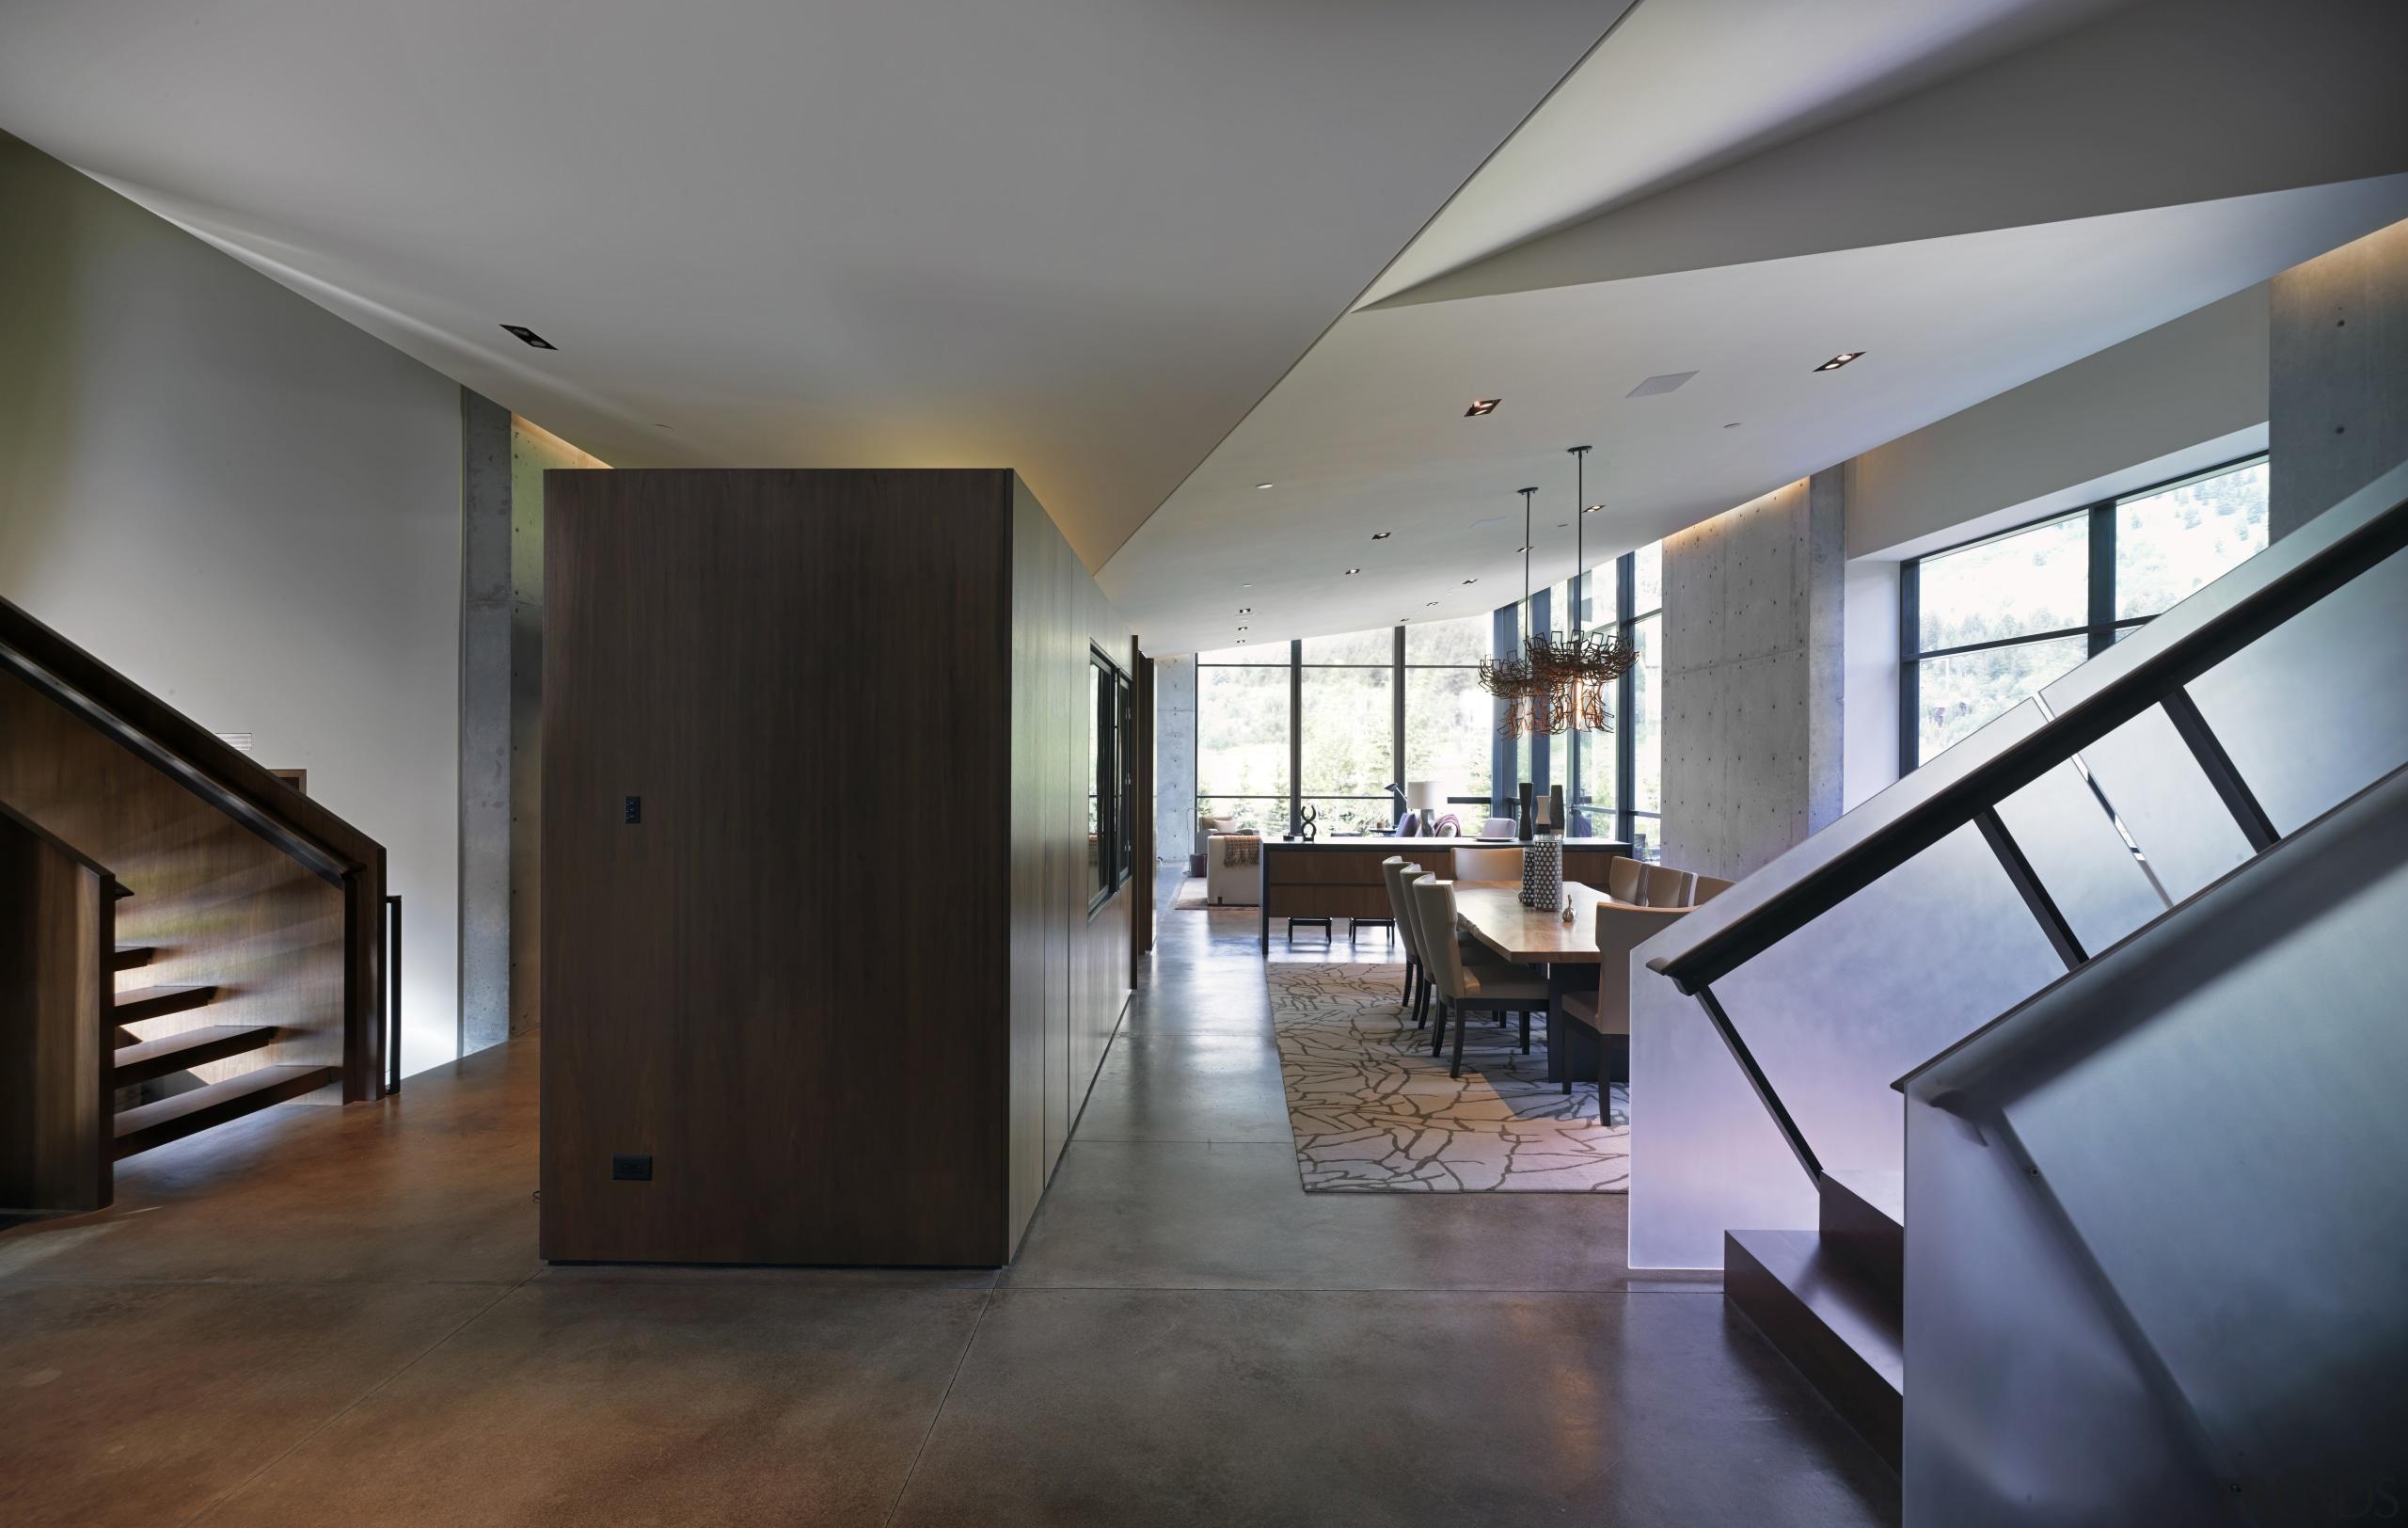 The inverted floating ceiling creates a modern aesthetic apartment, architecture, ceiling, condominium, daylighting, estate, floor, flooring, hardwood, house, interior design, living room, lobby, loft, property, real estate, room, stairs, window, wood, wood flooring, gray, black